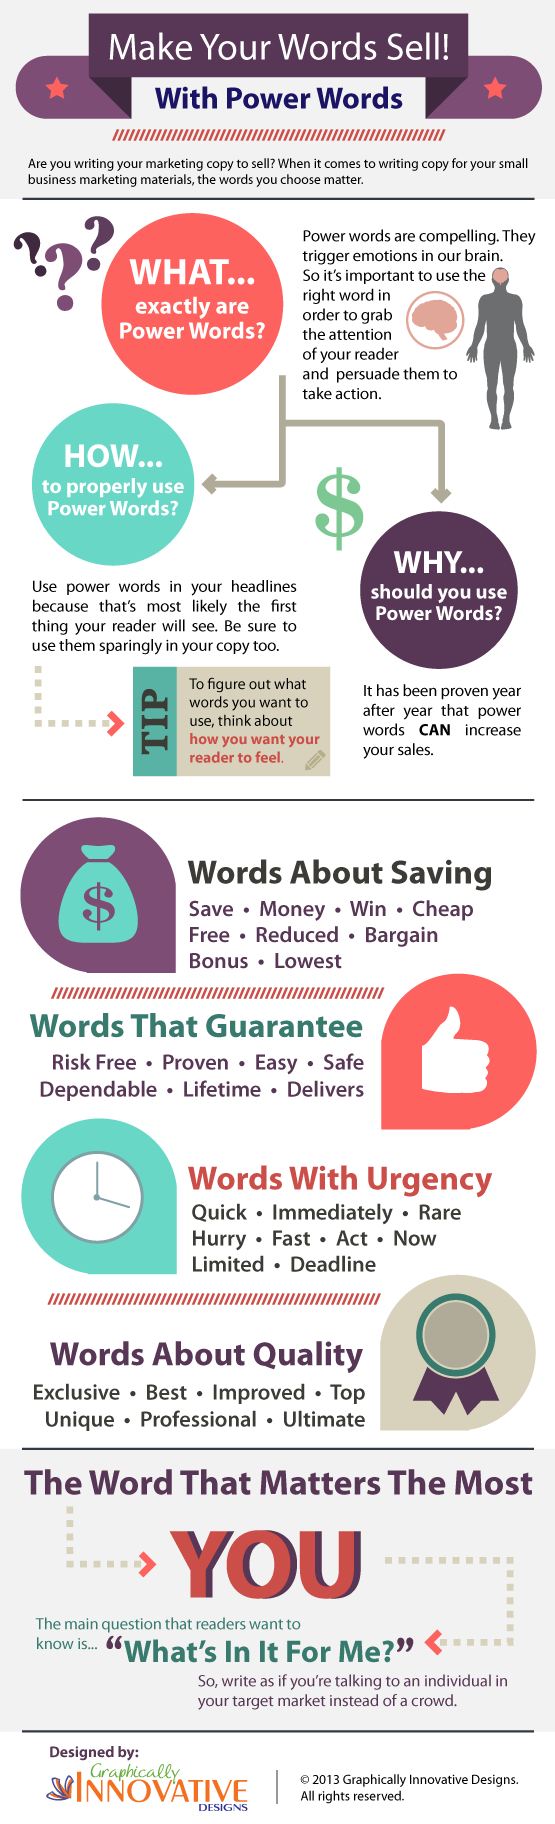 Using Power Words